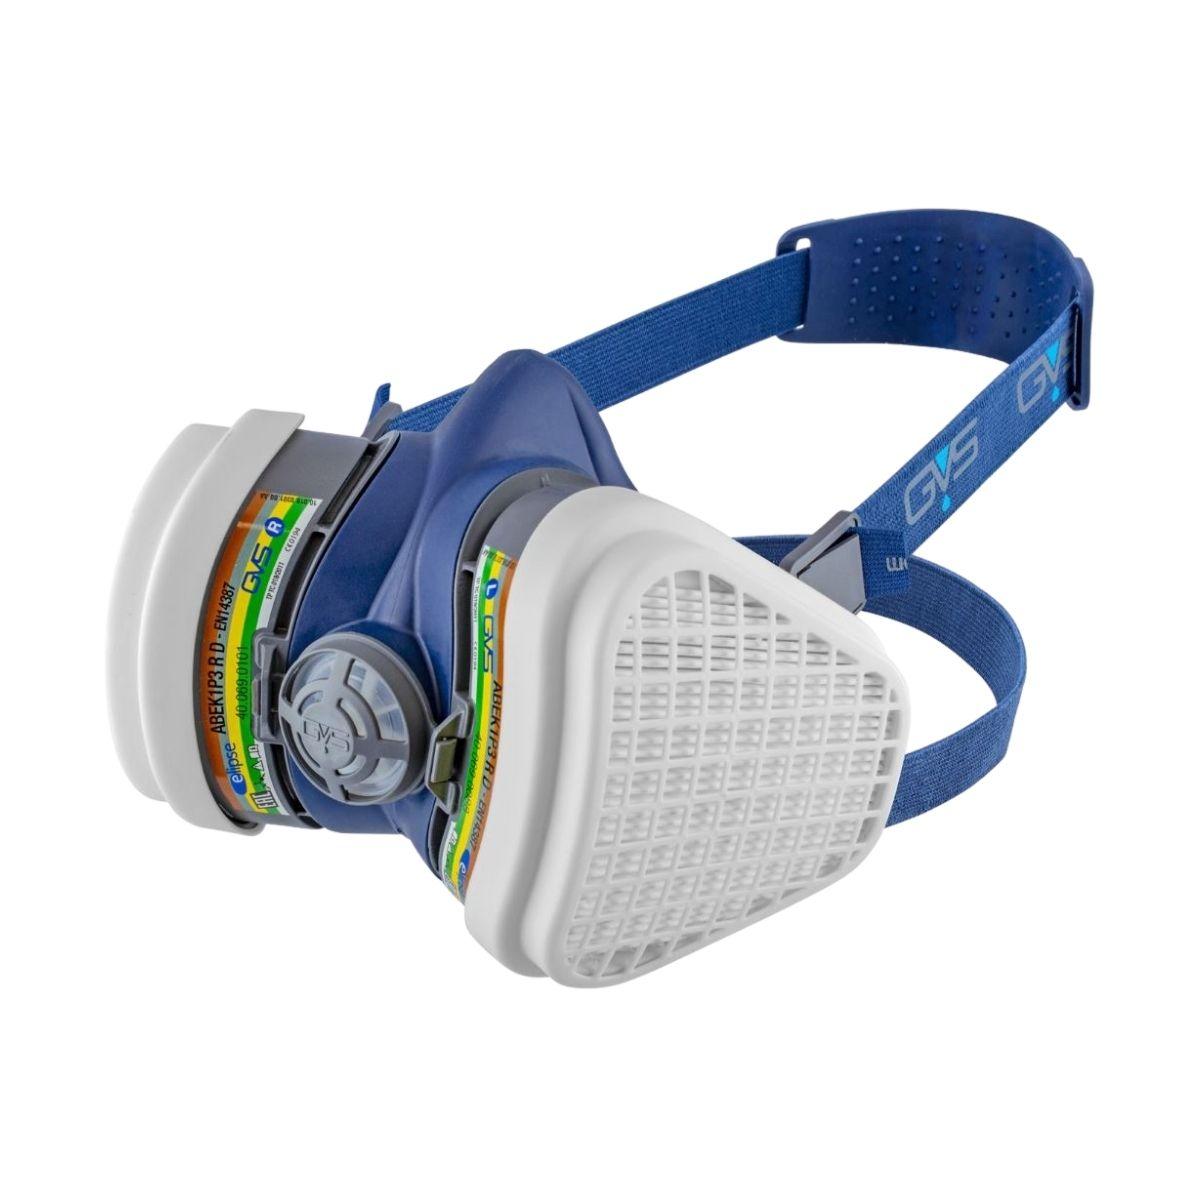 RP0021 Elipse Low Profile Half Mask c_w ABEK1-P3 RD Filters